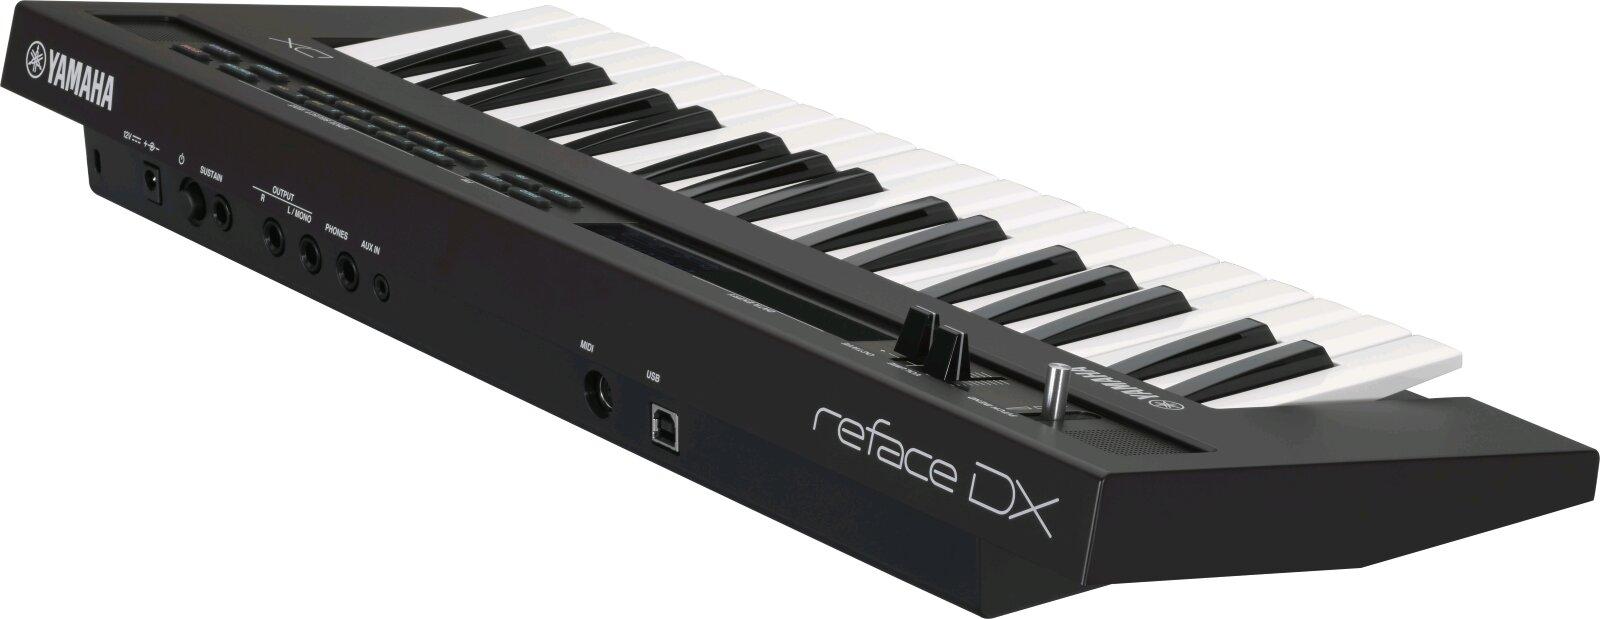 Yamaha Reface DX Mini keyboard : photo 3